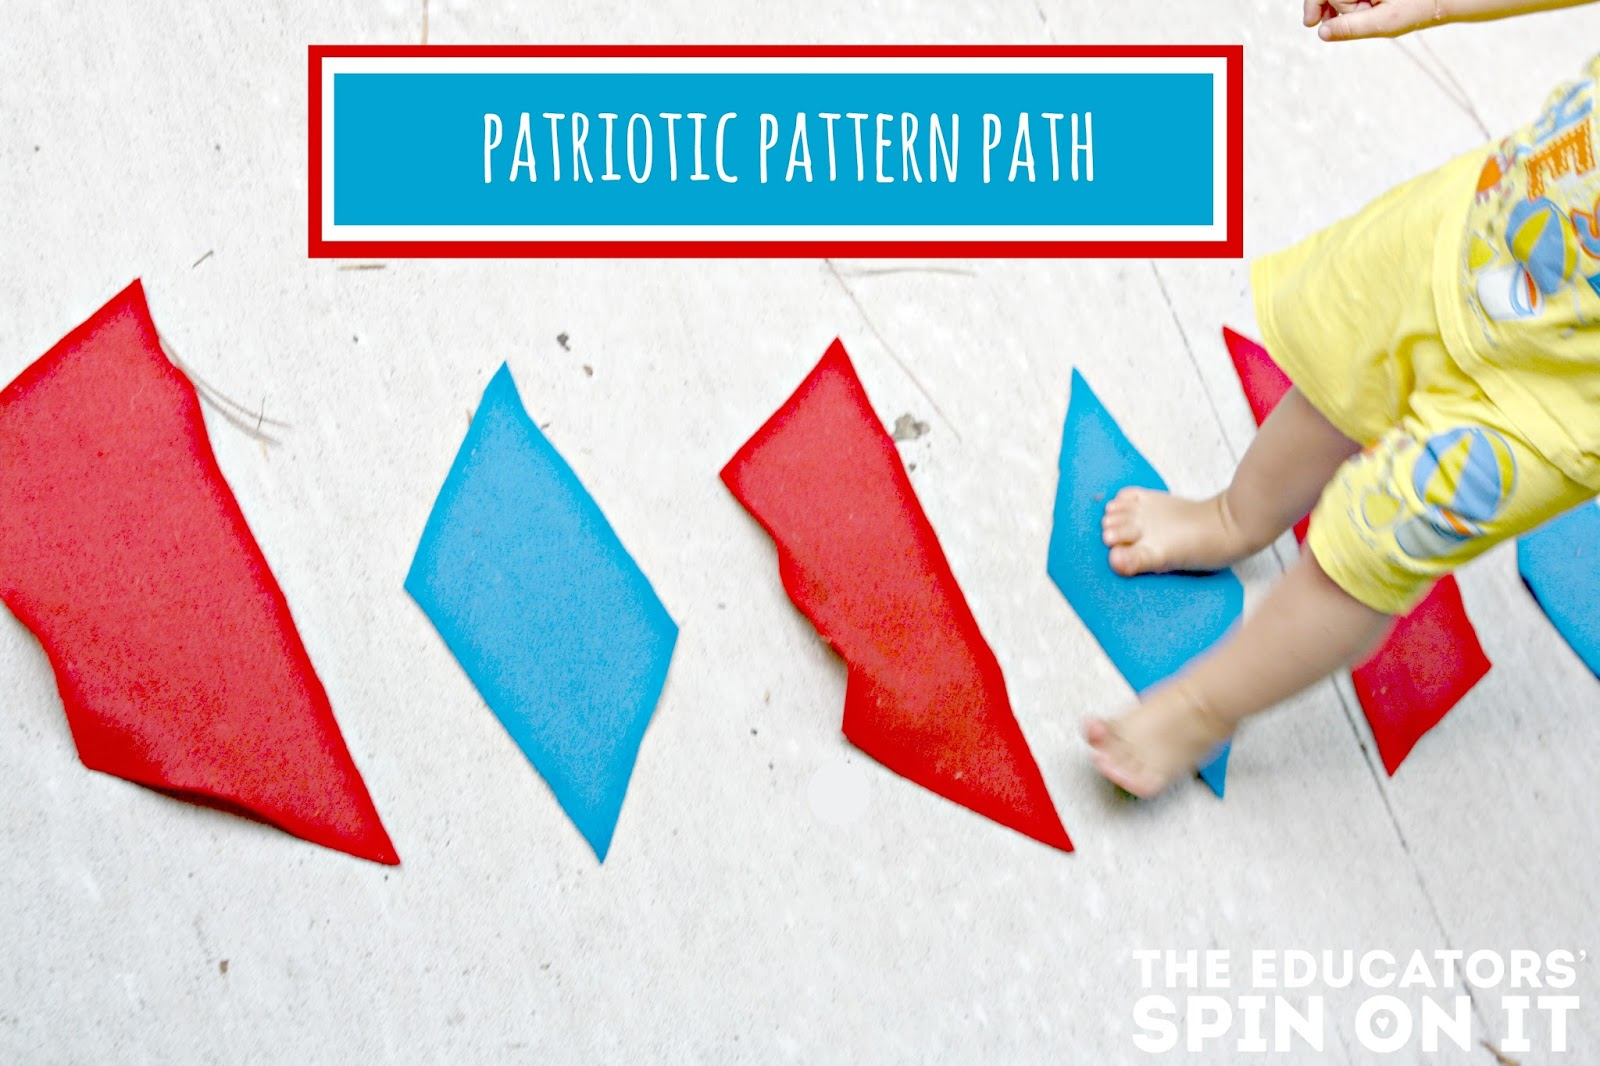 Patterning with Giant Pattern Blocks: Preschool Math and Movement